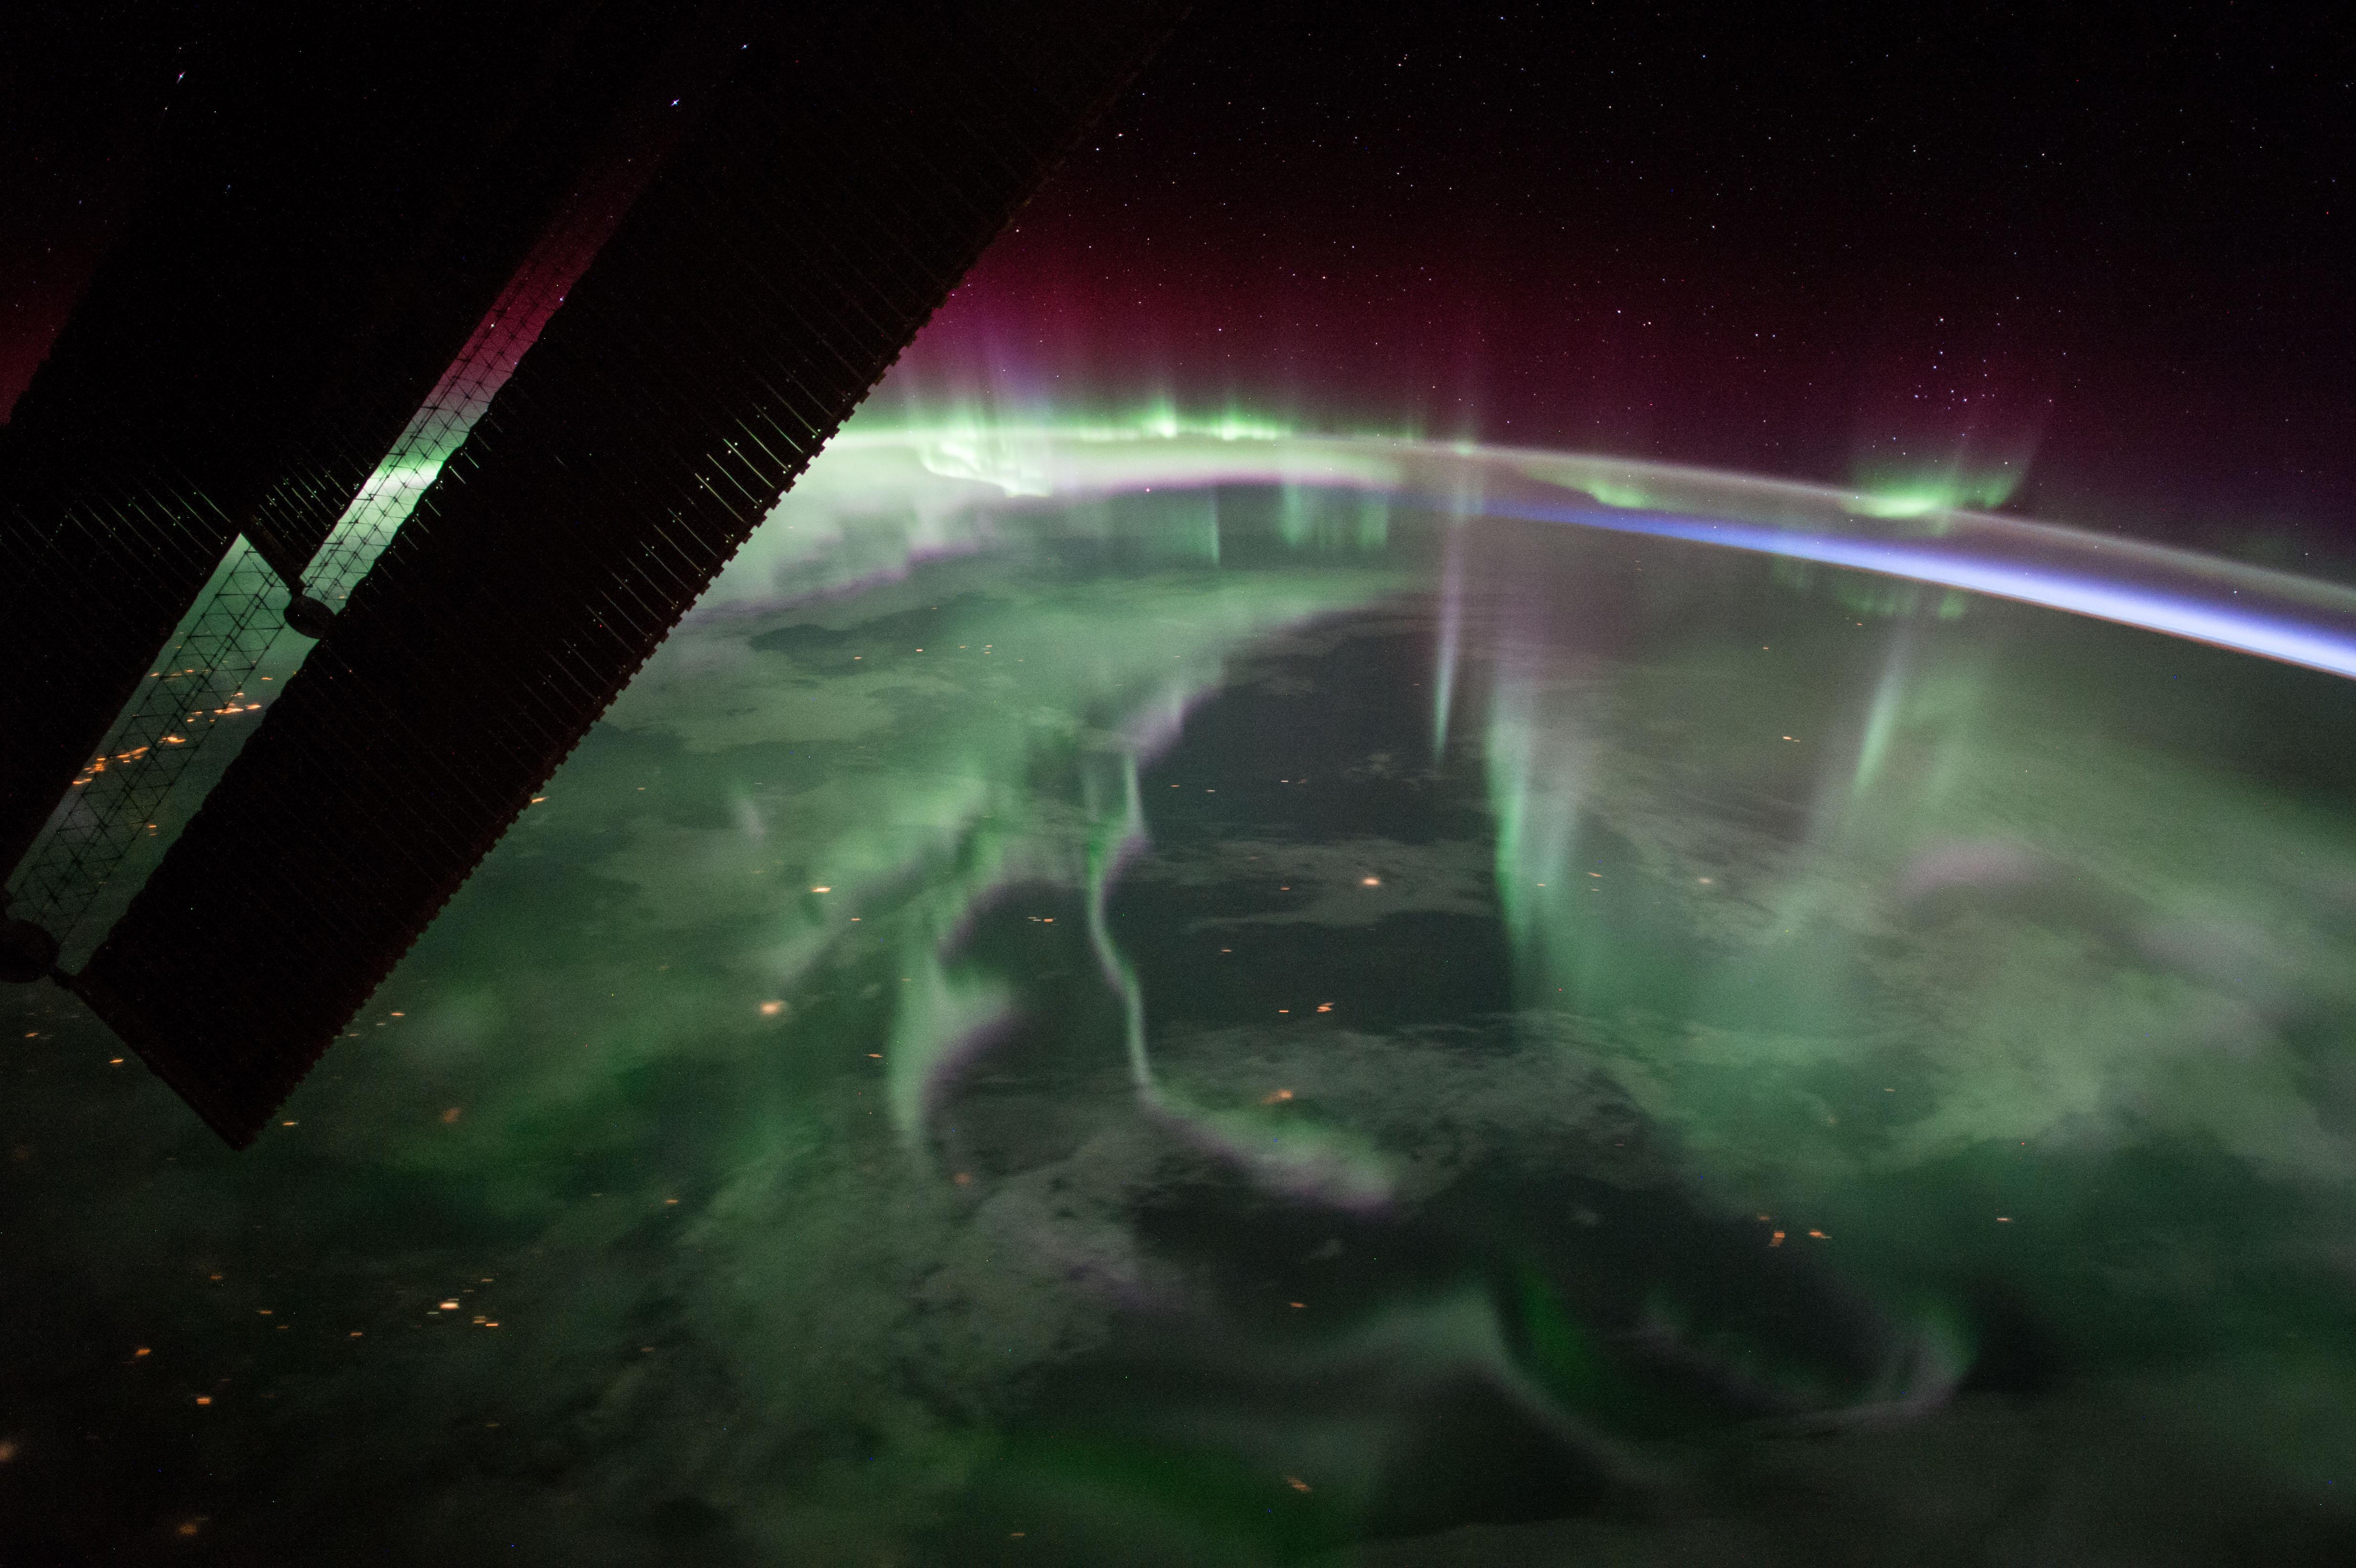 The aurora borealis from Jupiter